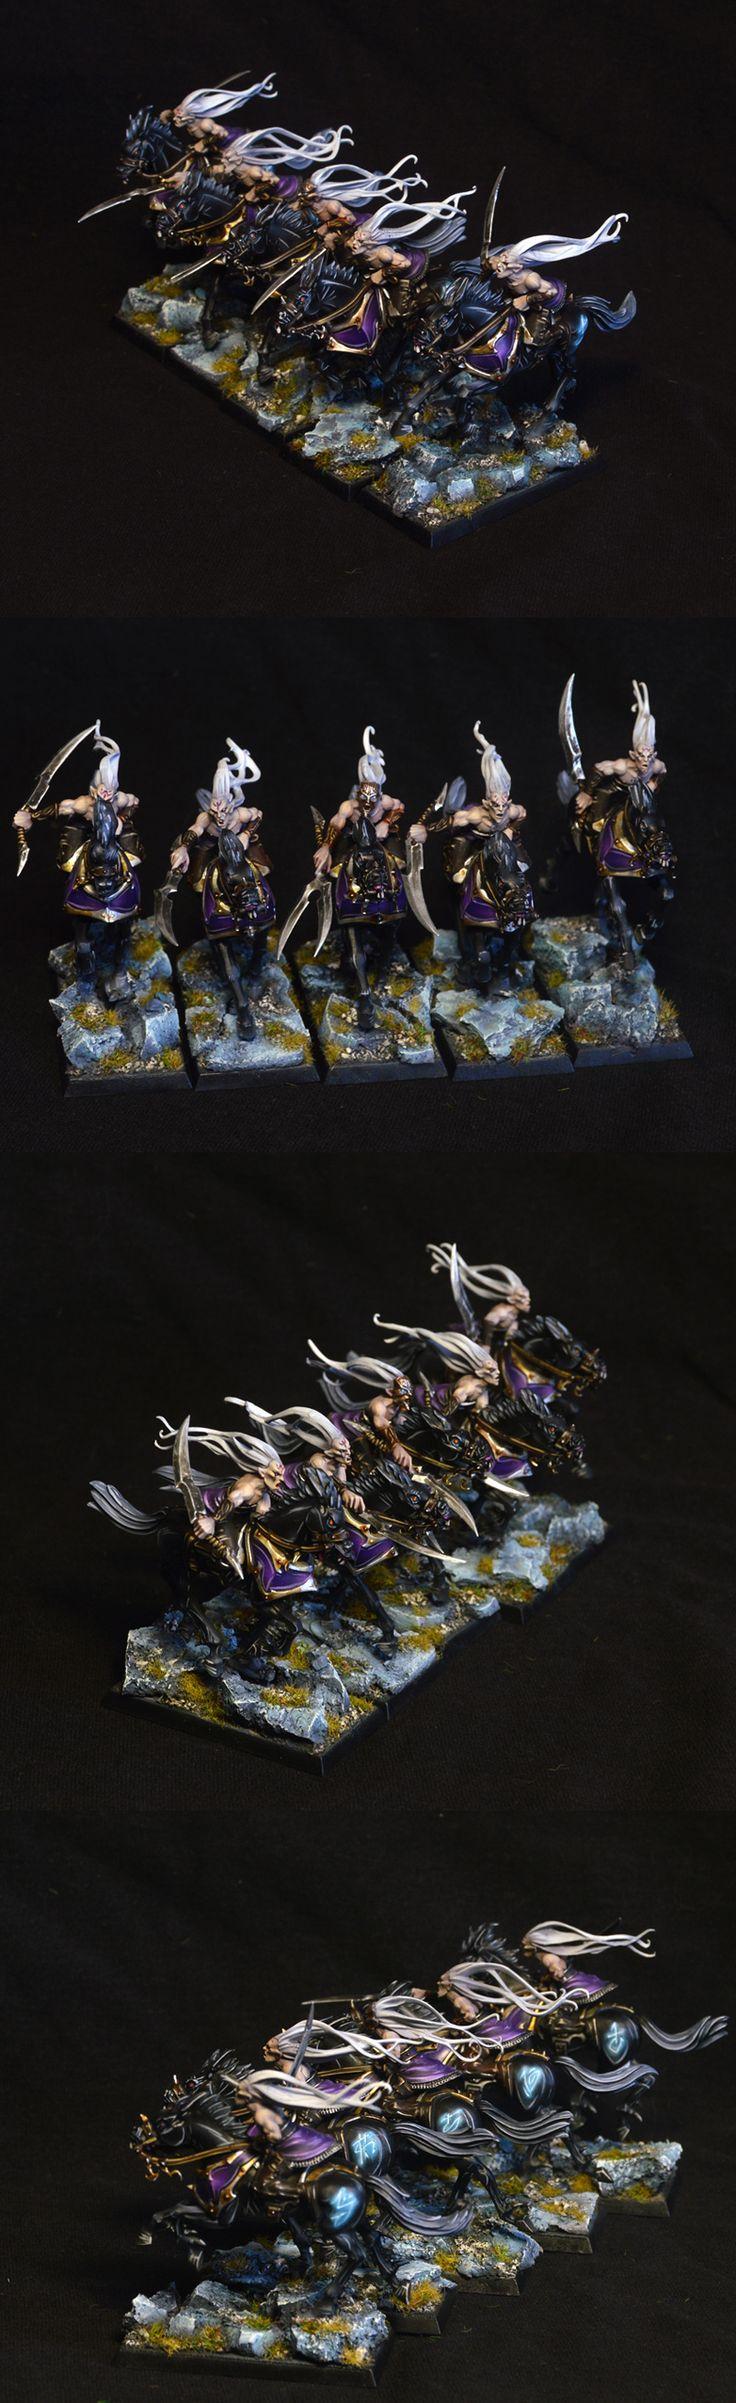 CoolMiniOrNot - Dark Elves Doomfire Warlocks by kommissar Manul